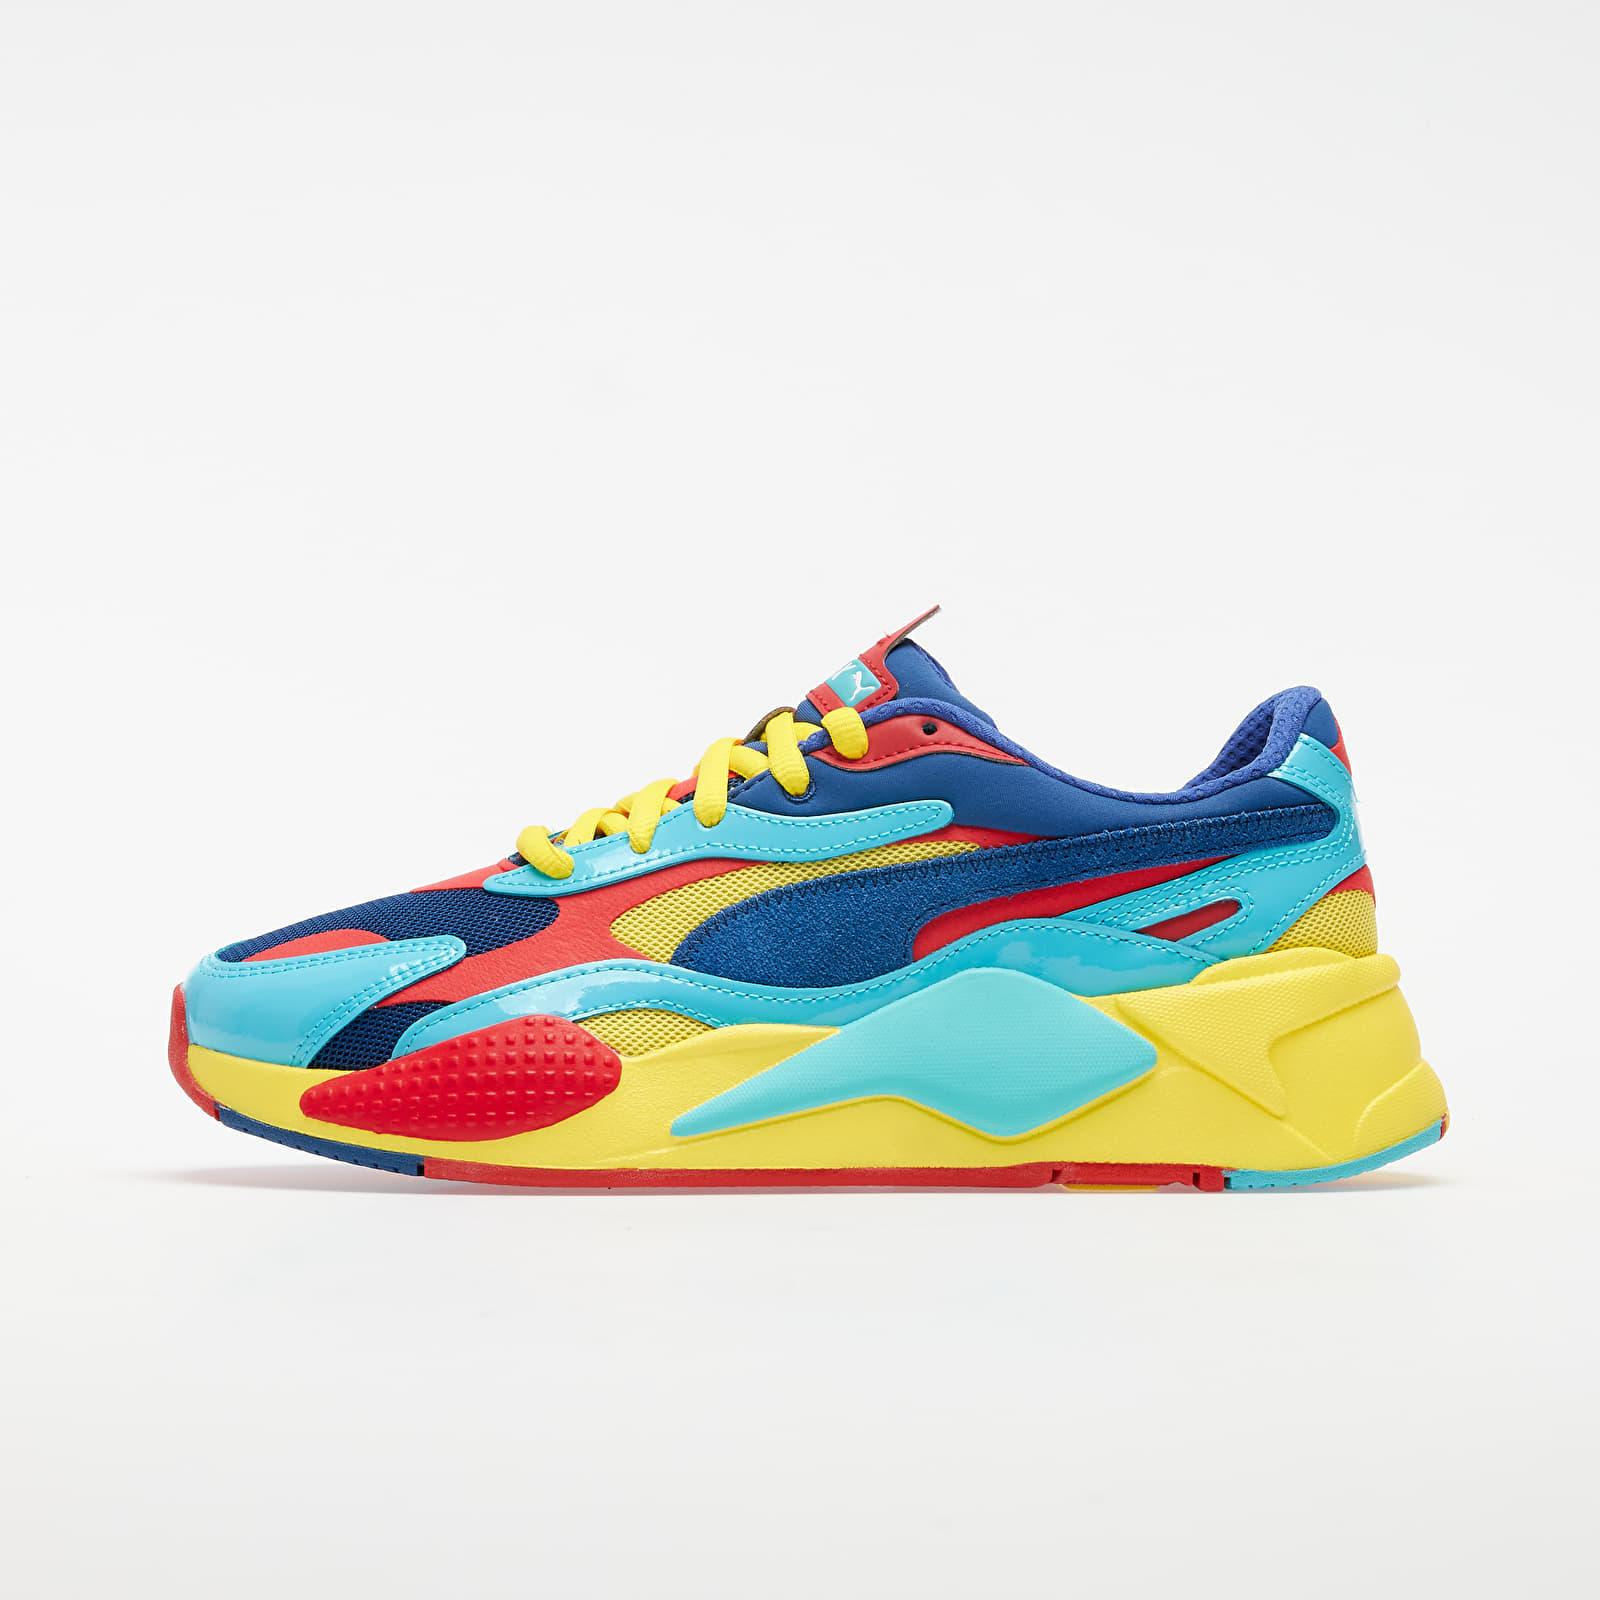 Pánské tenisky a boty Puma RS-X³ Plastic Limoges-High Risk Red